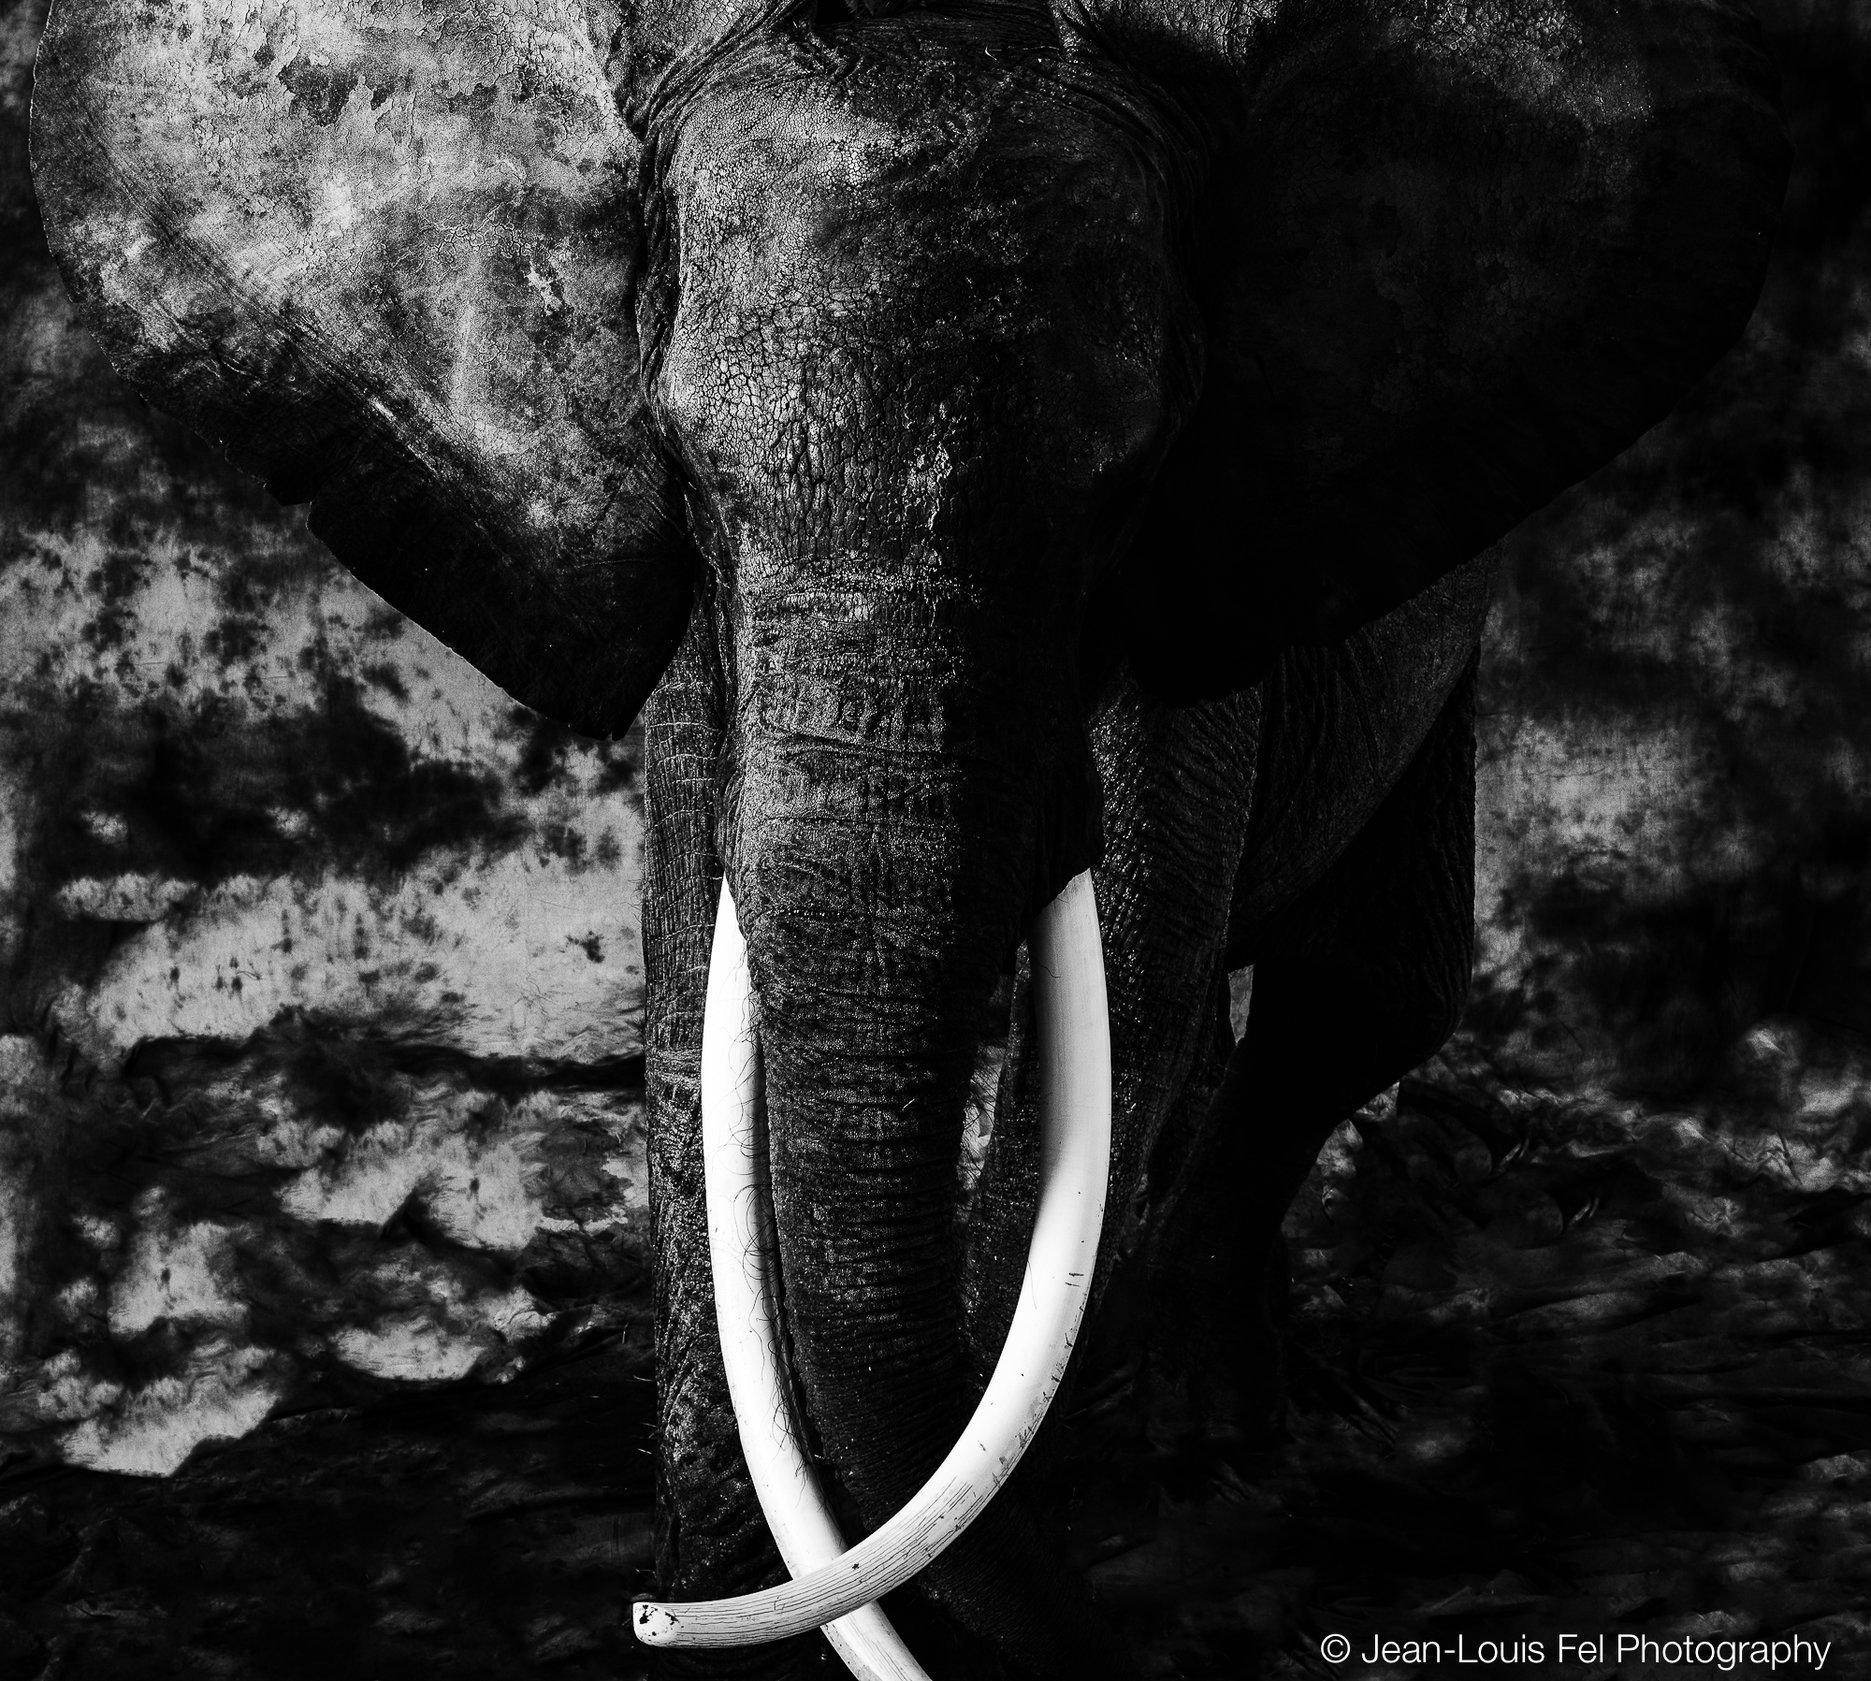 JLF_ELEPHANT_006.jpg